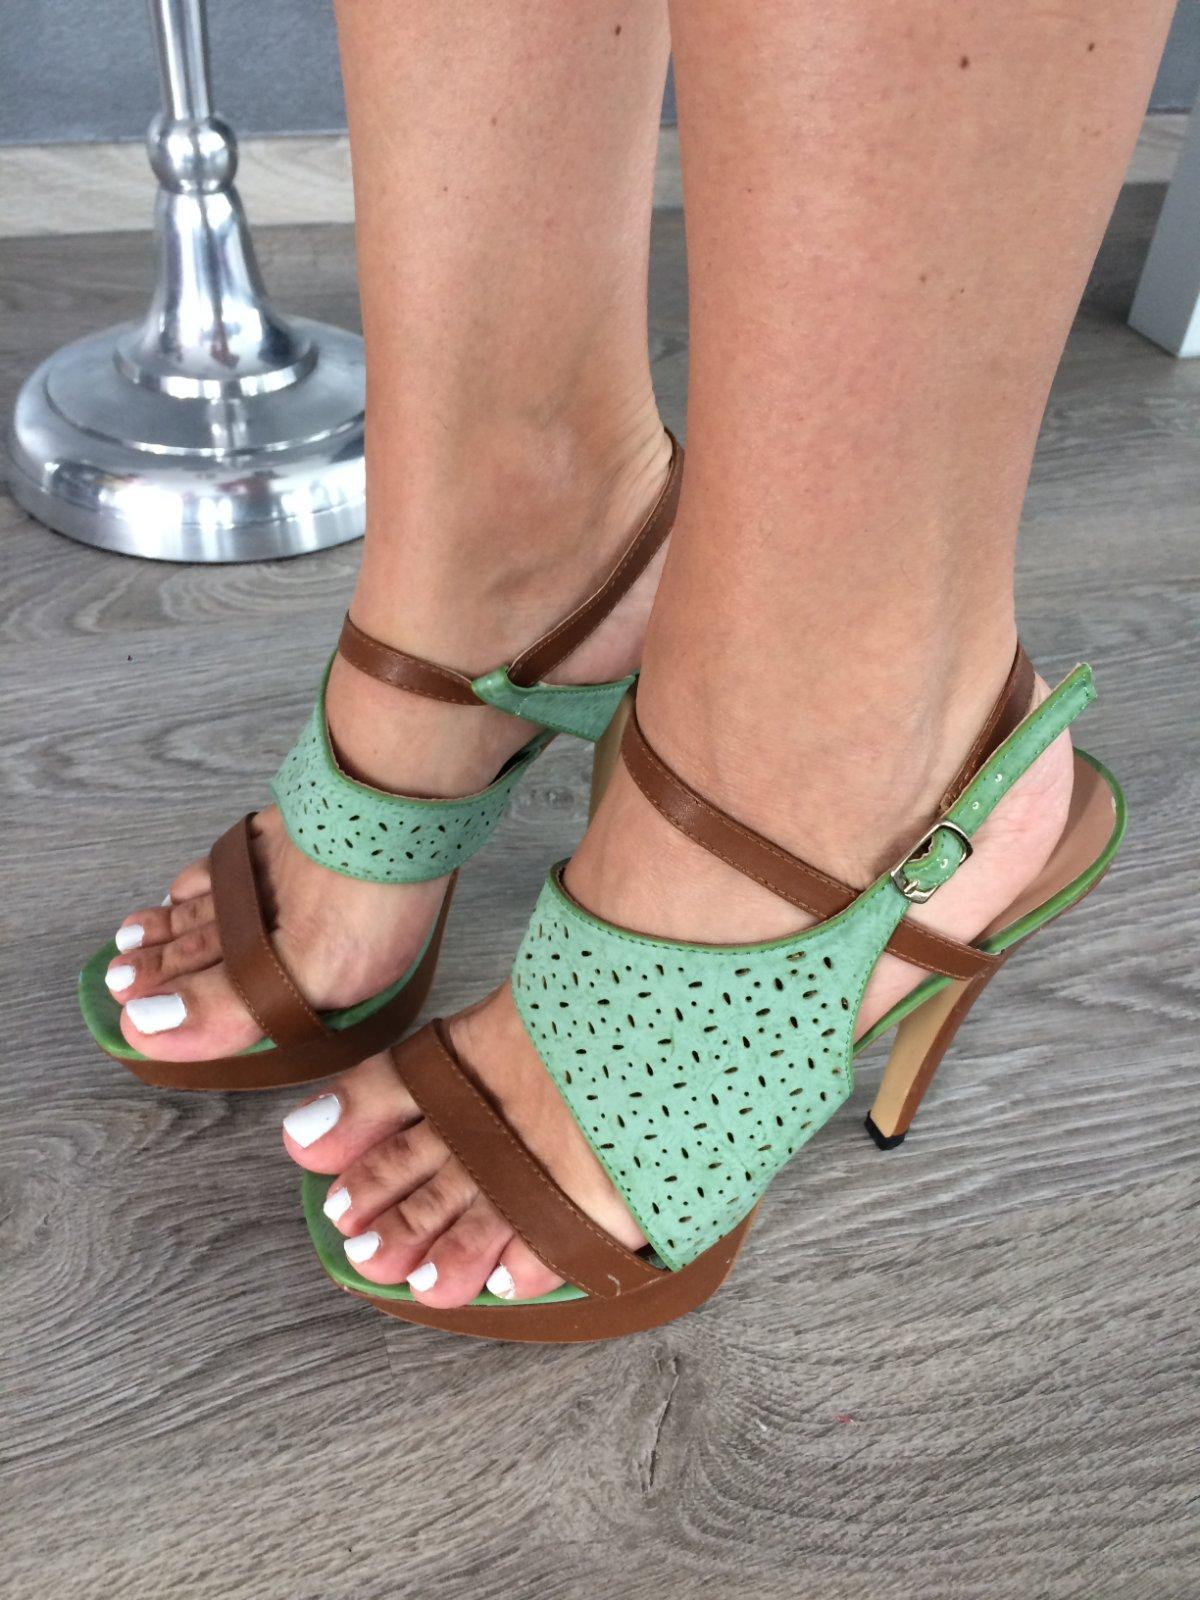 5c270cce3f81 Letne damske vysoke sandale sandalky